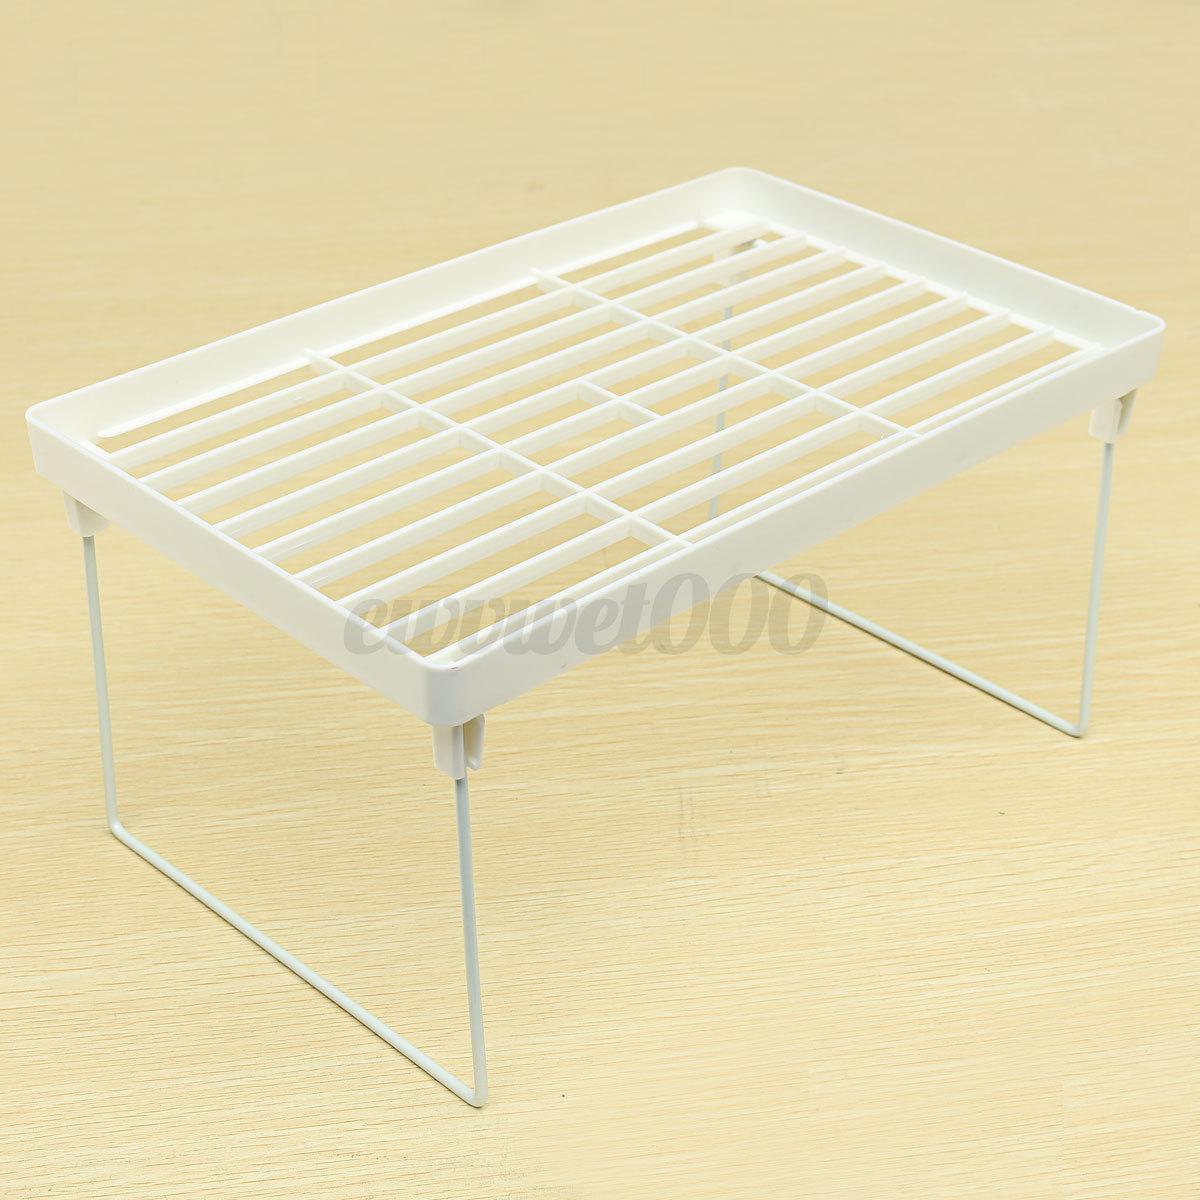 Plastic Kitchen Shelf: Plastic Stackable Storage Rack Shelf Bathroom Kitchen